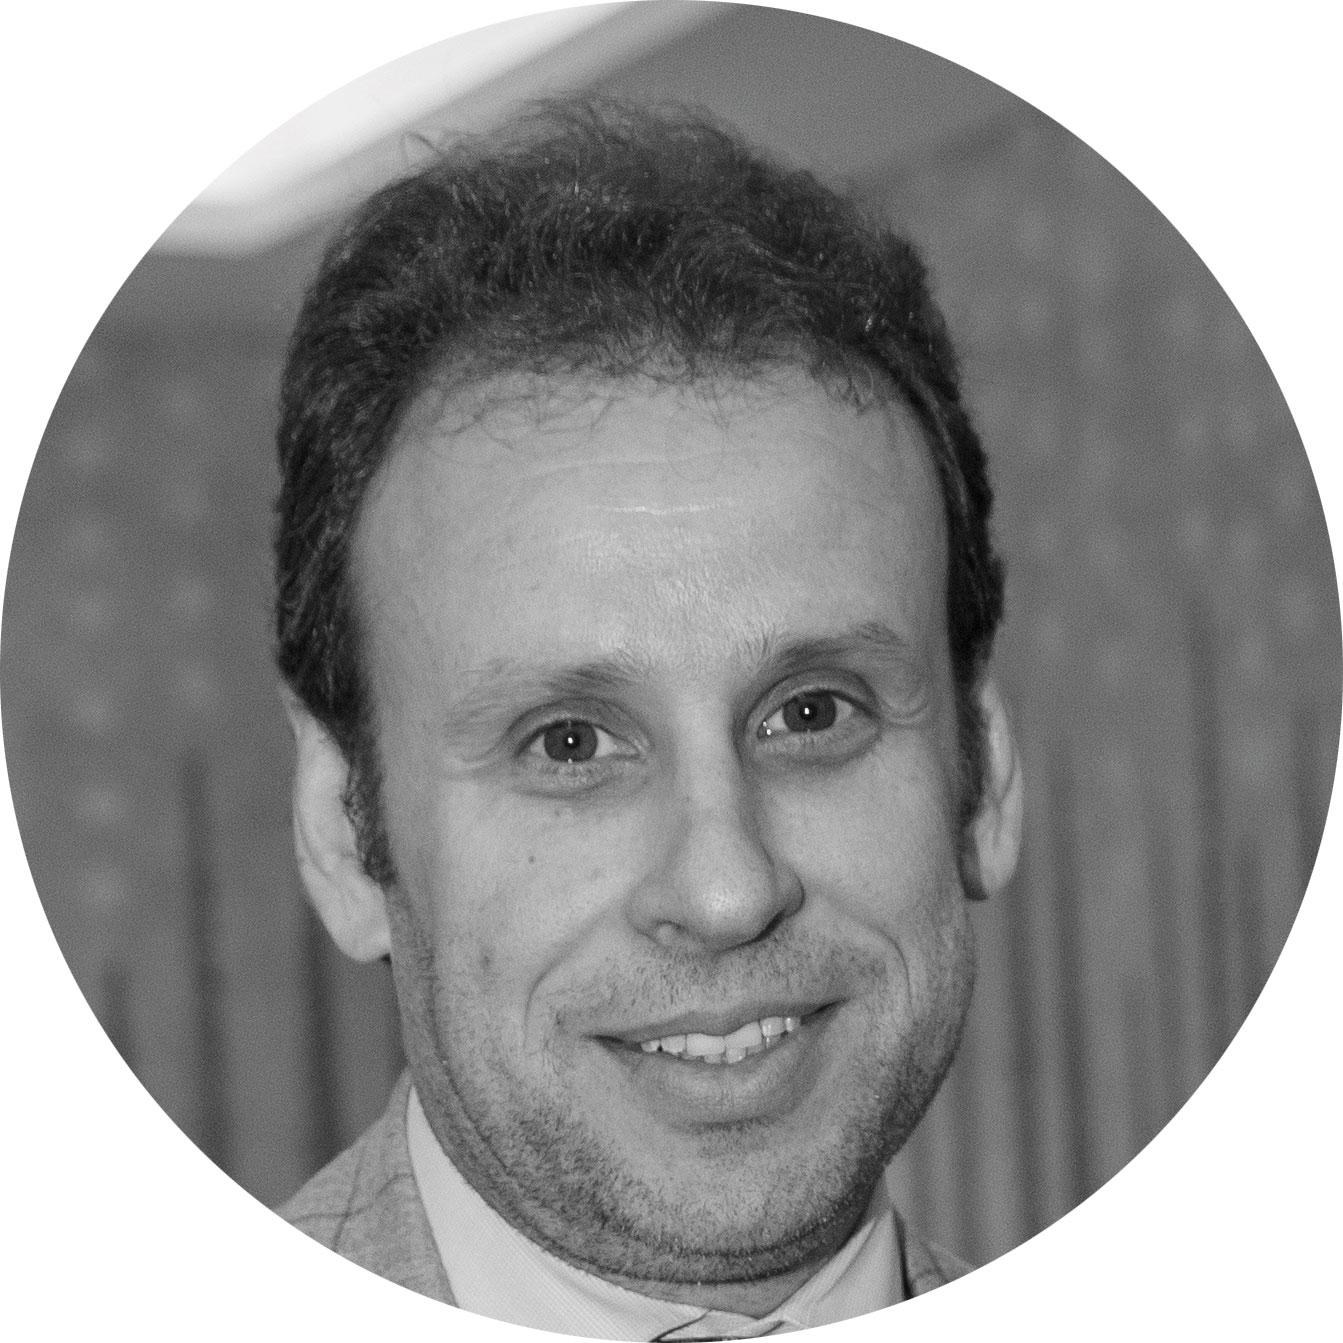 Giuseppe Covato, chief technology innovation officer, La Stampa